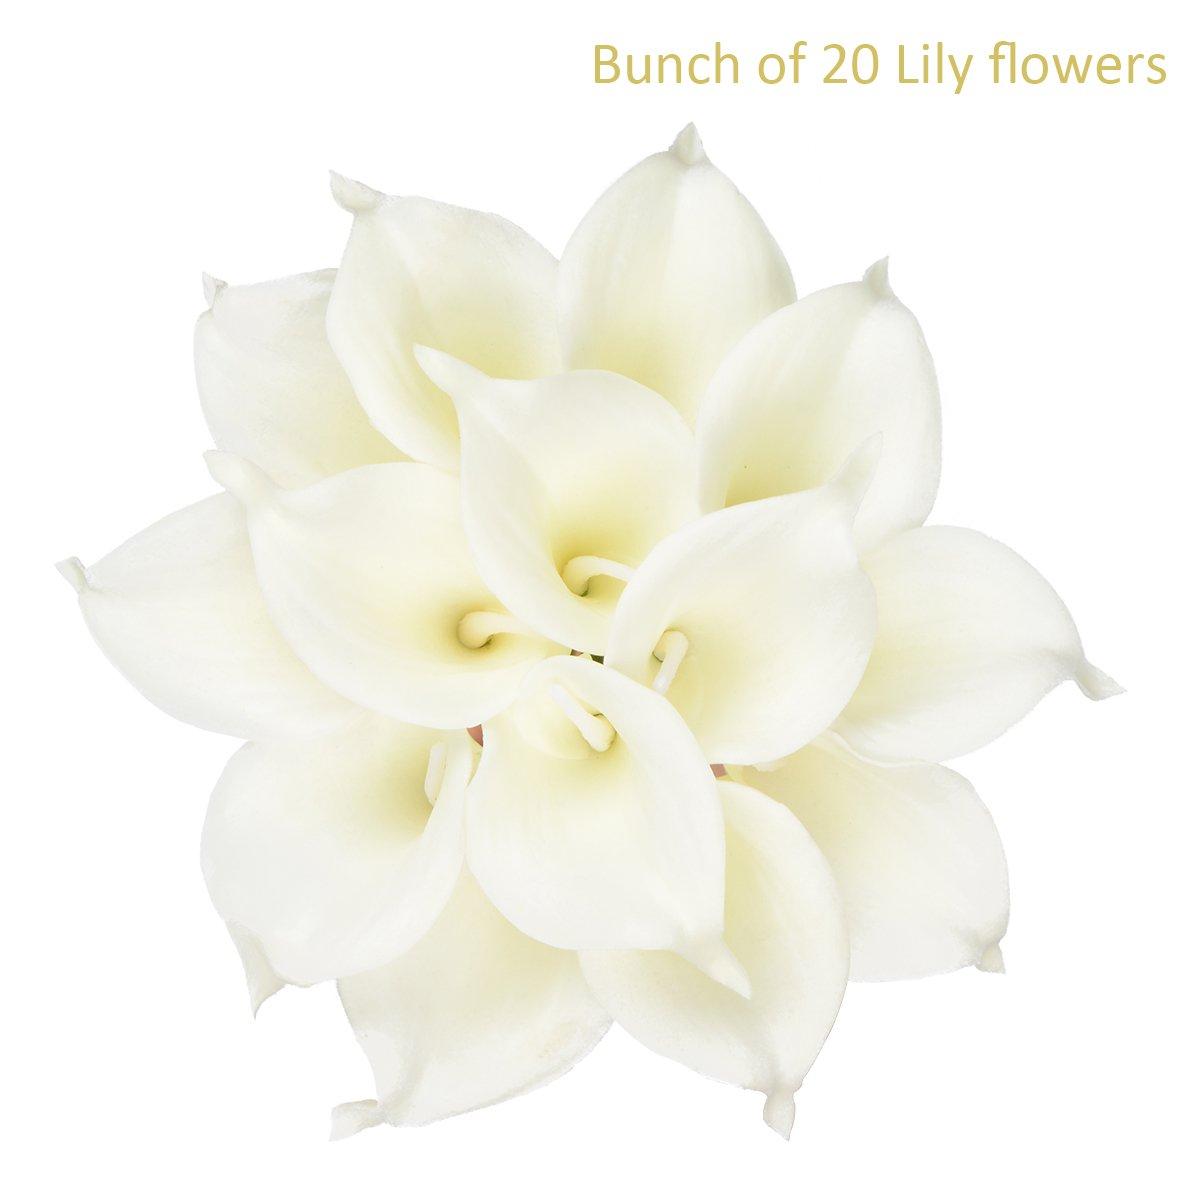 Amazon Hovebeaty Calla Lily Bridal Wedding Festival Decor